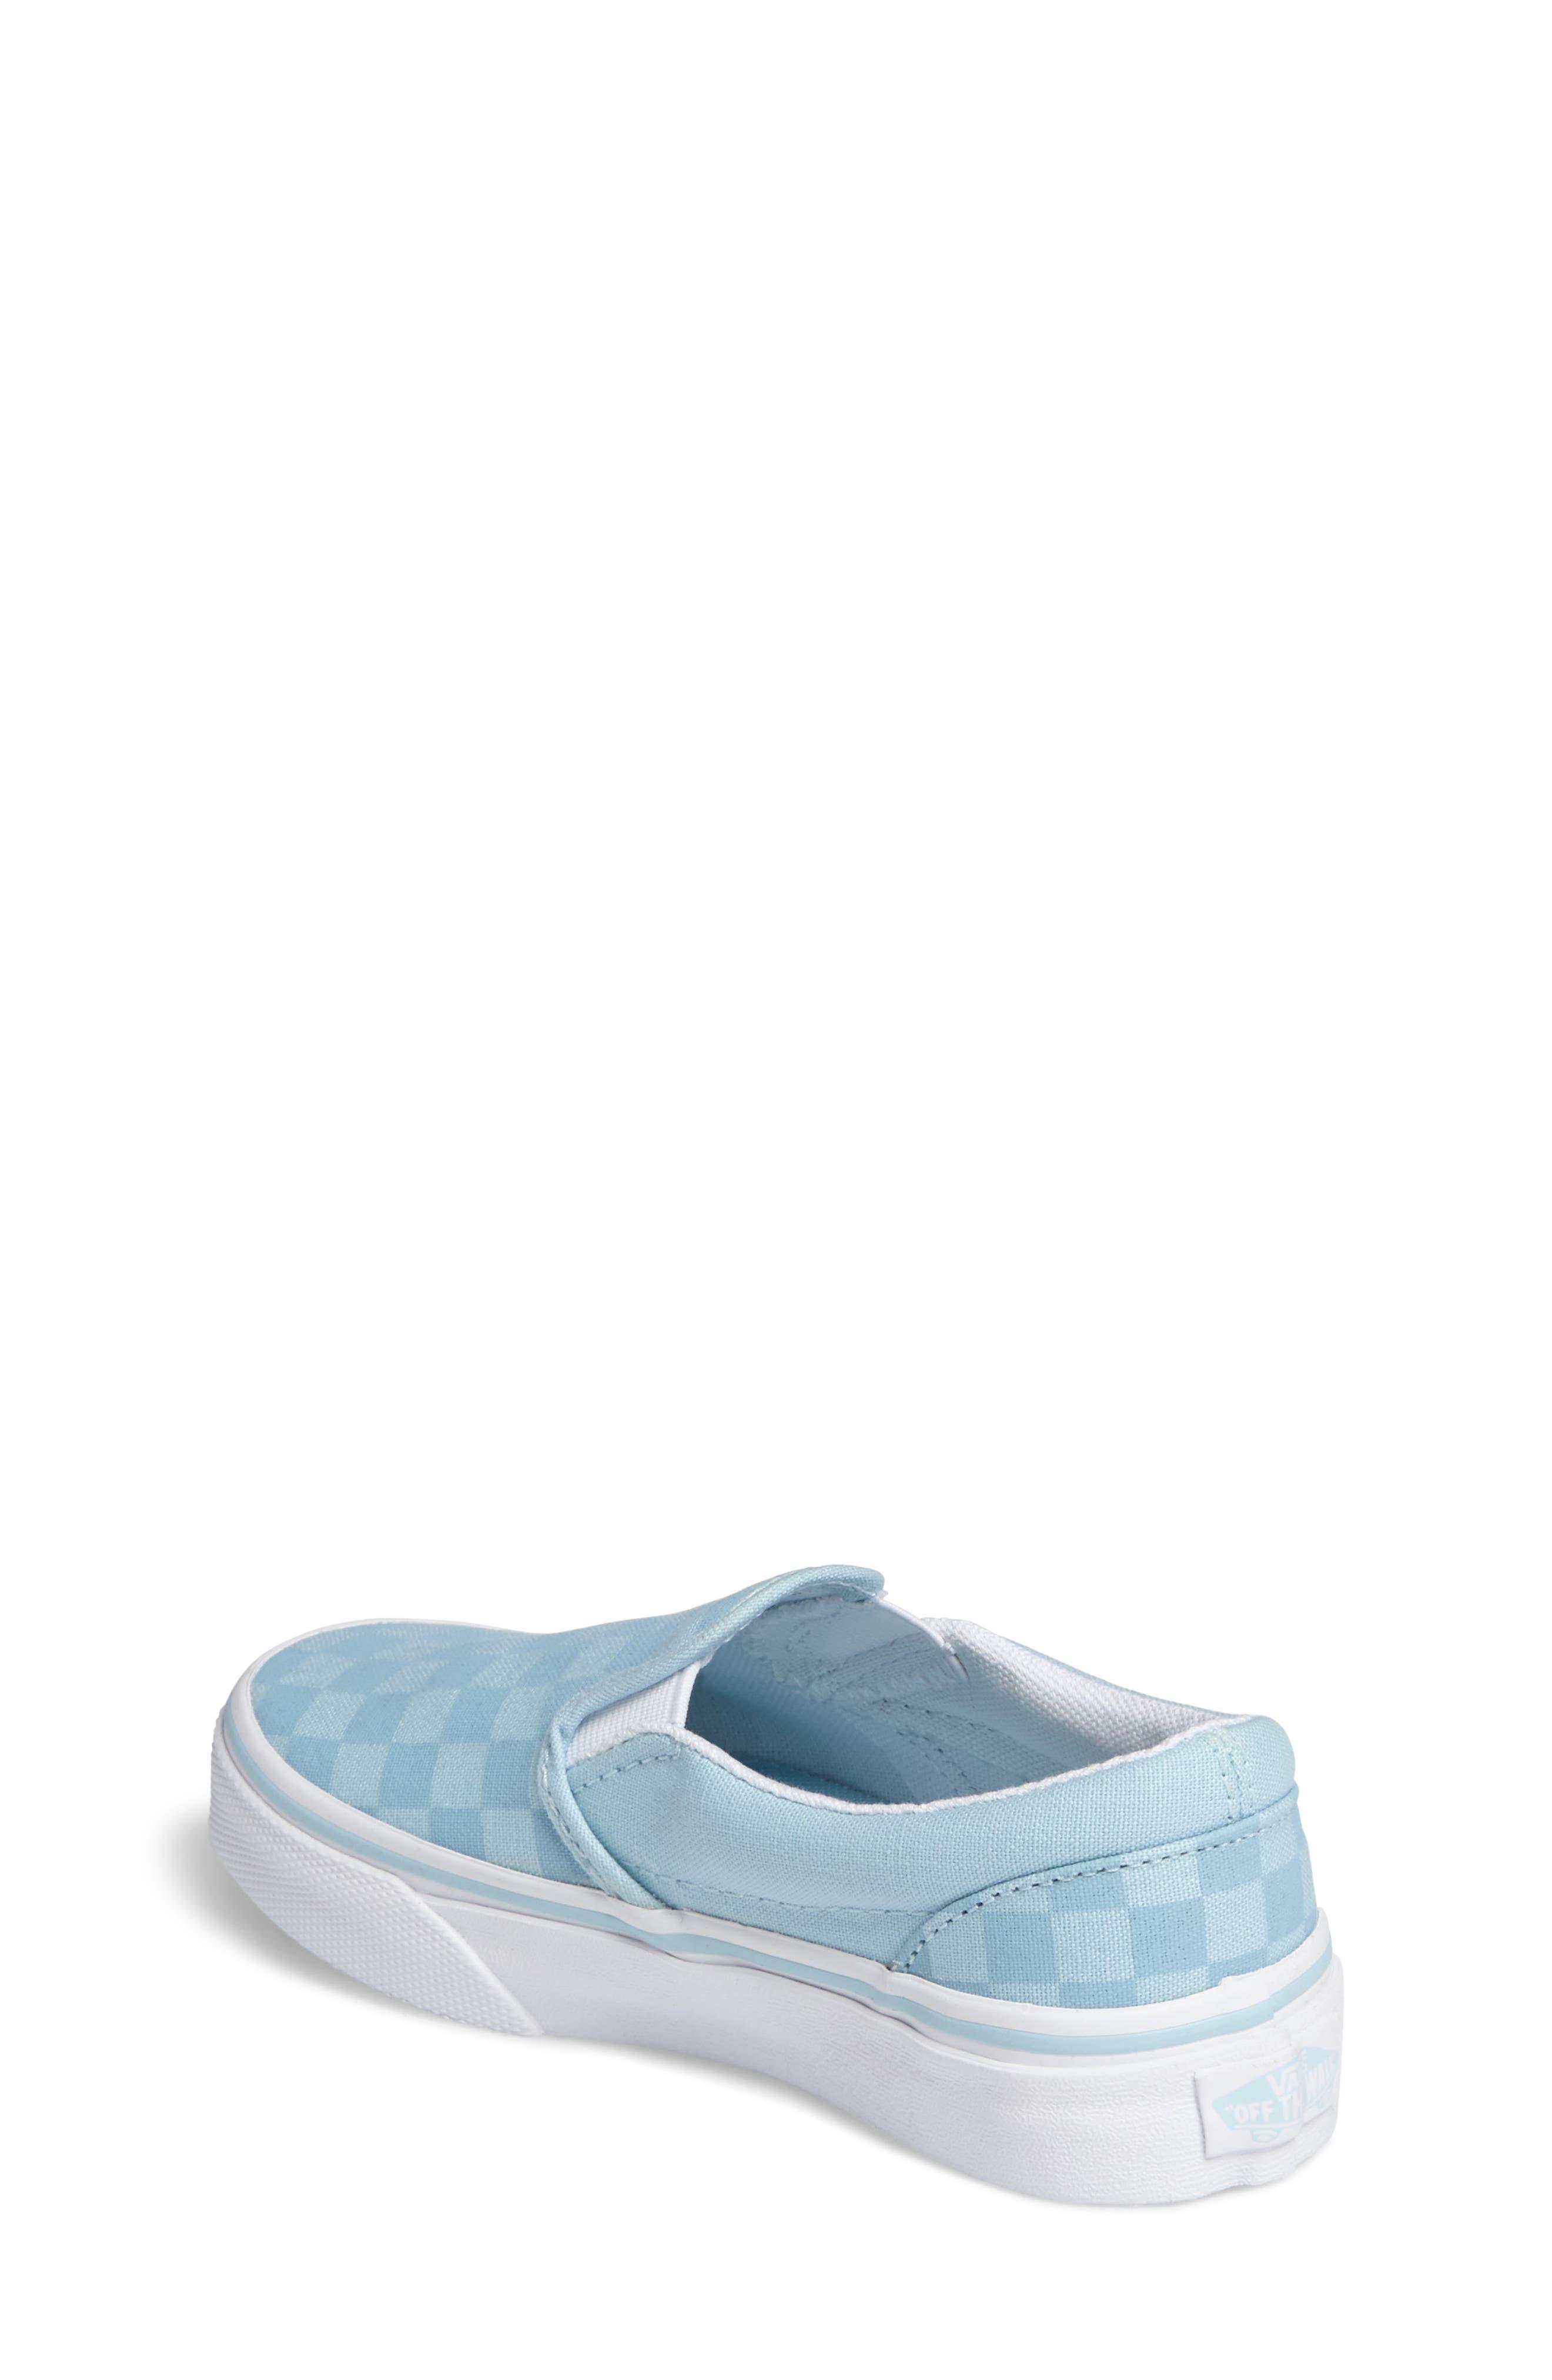 Alternate Image 2  - Vans Classic Slip-On Sneaker (Walker, Toddler, Little Kid & Big Kid)